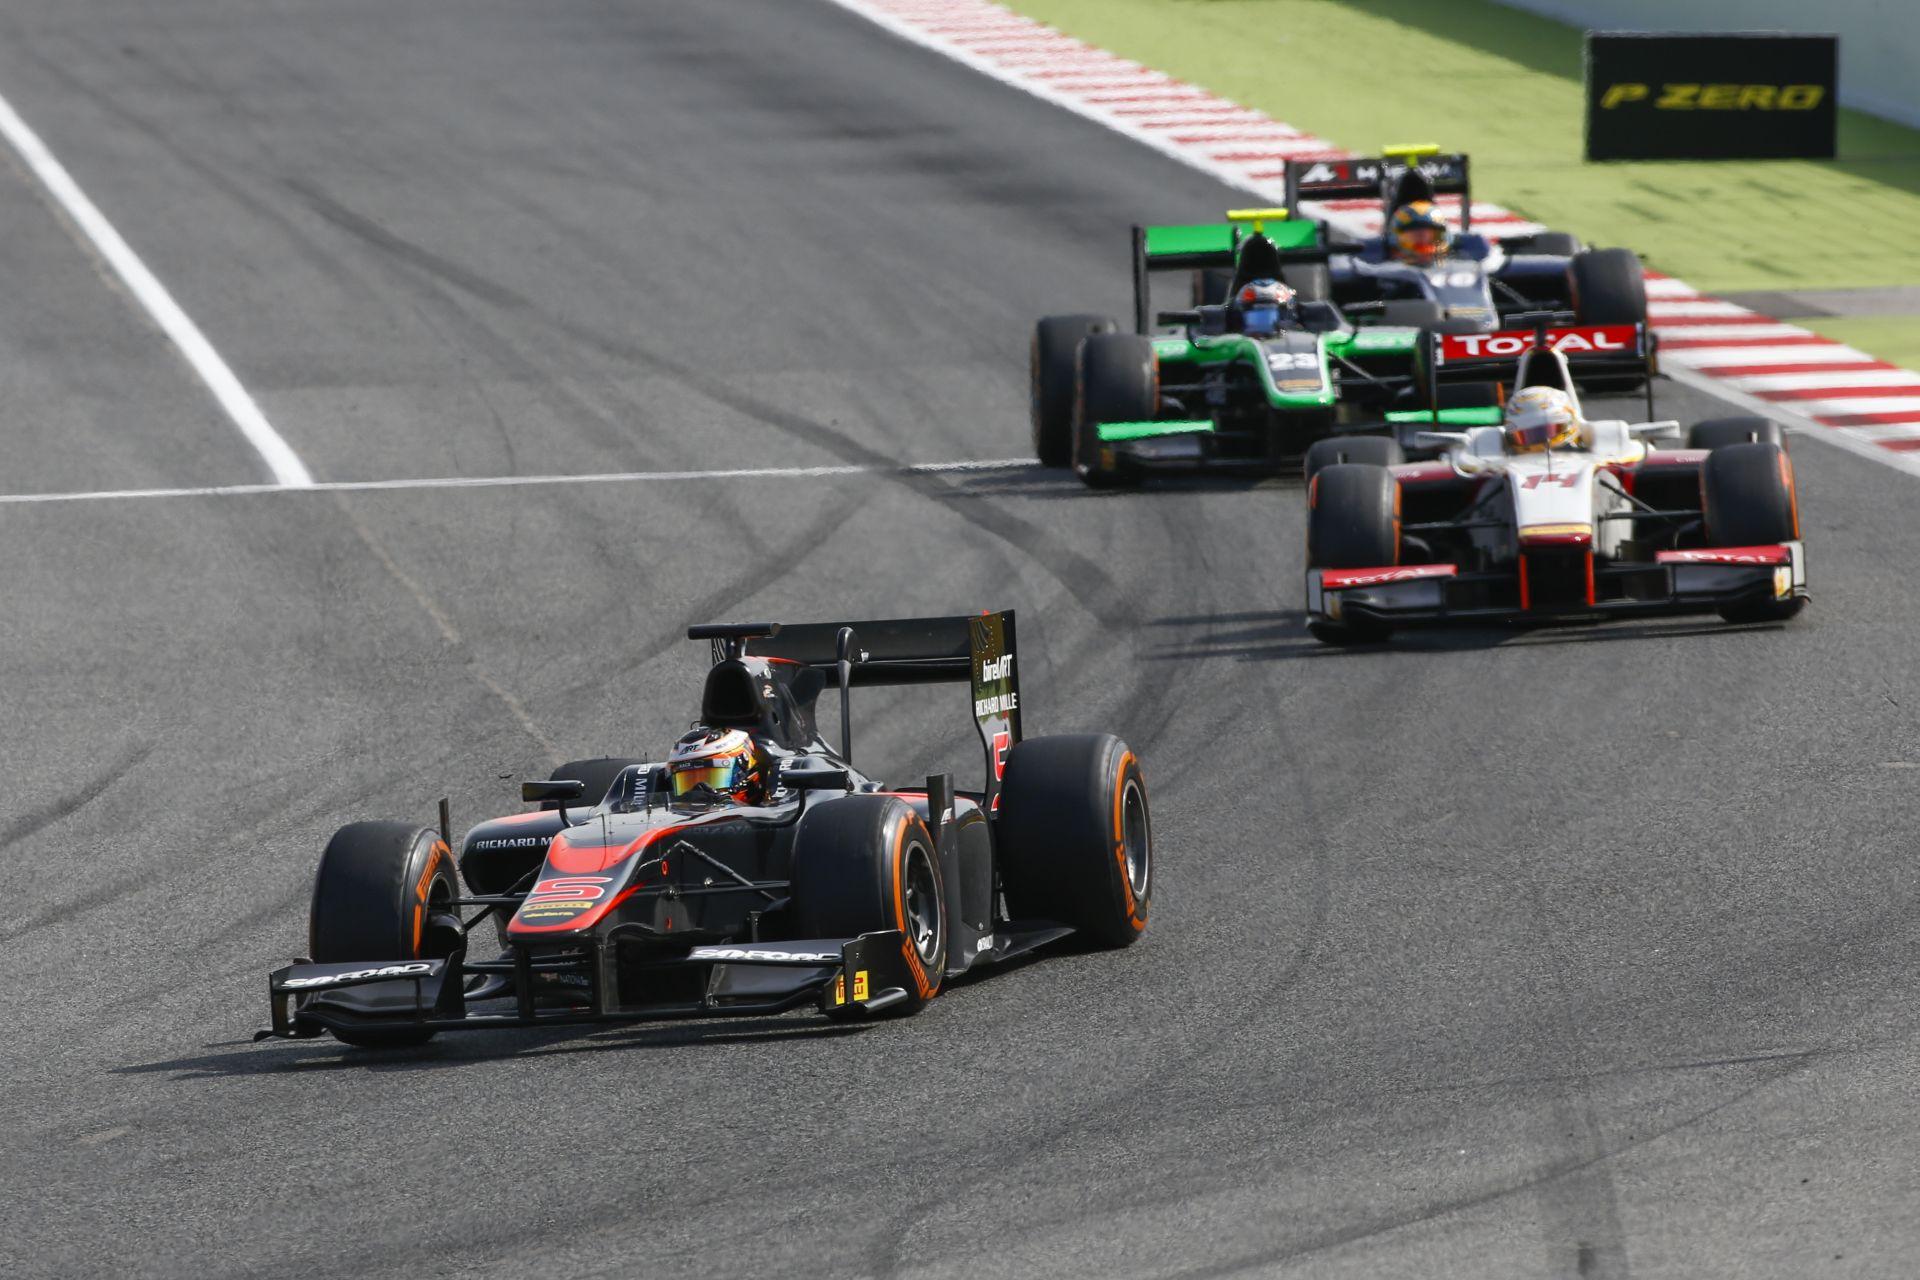 A McLaren örülne a GP2-es csapatoknak a Forma-1-ben!